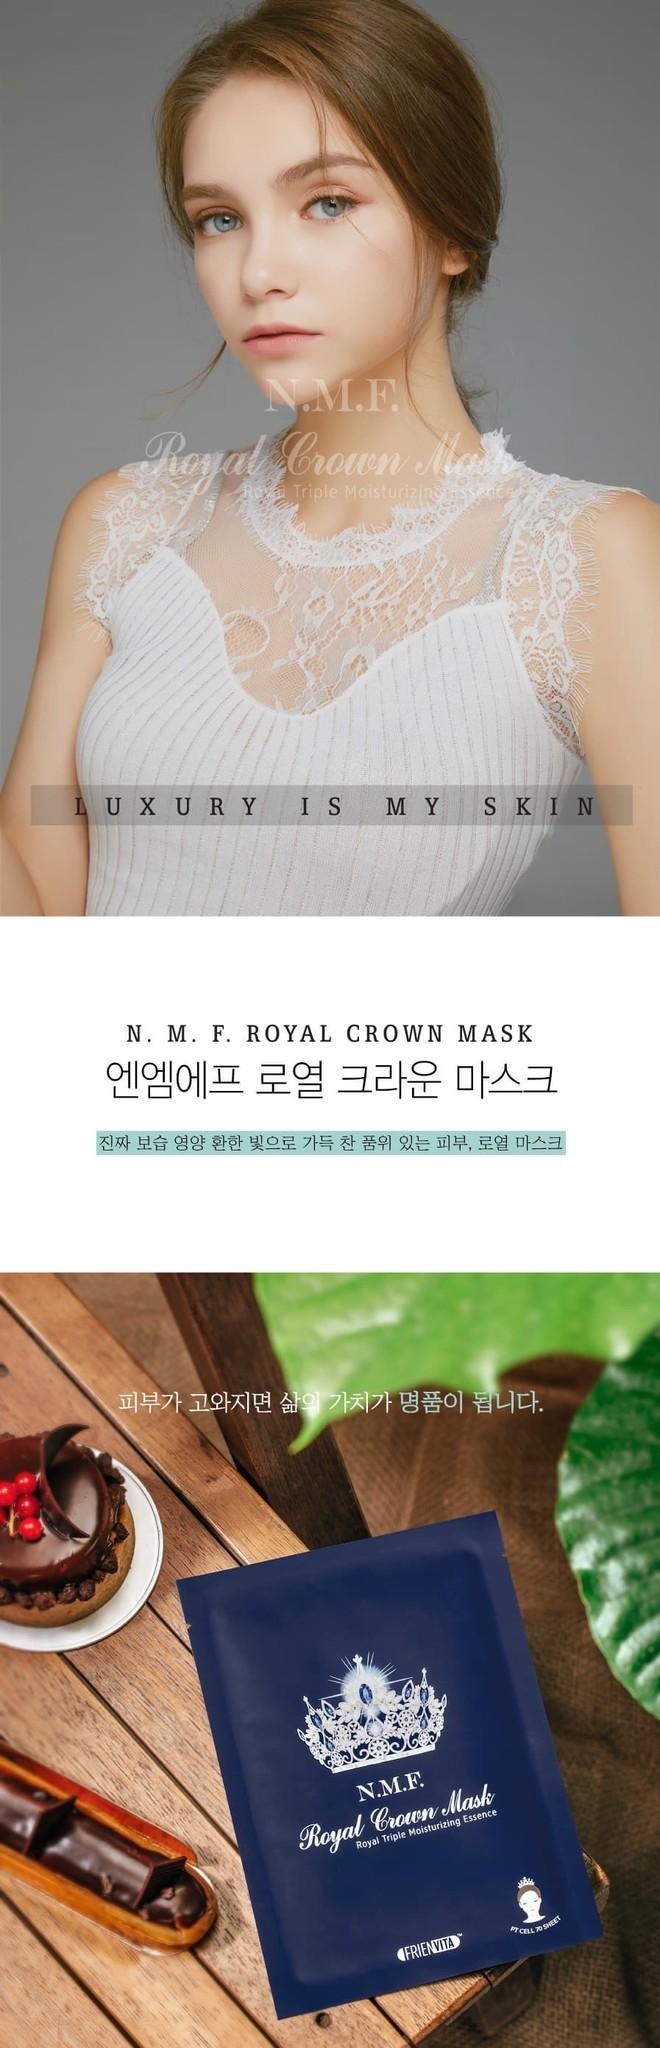 N.M.F Royal Crown Mask-2